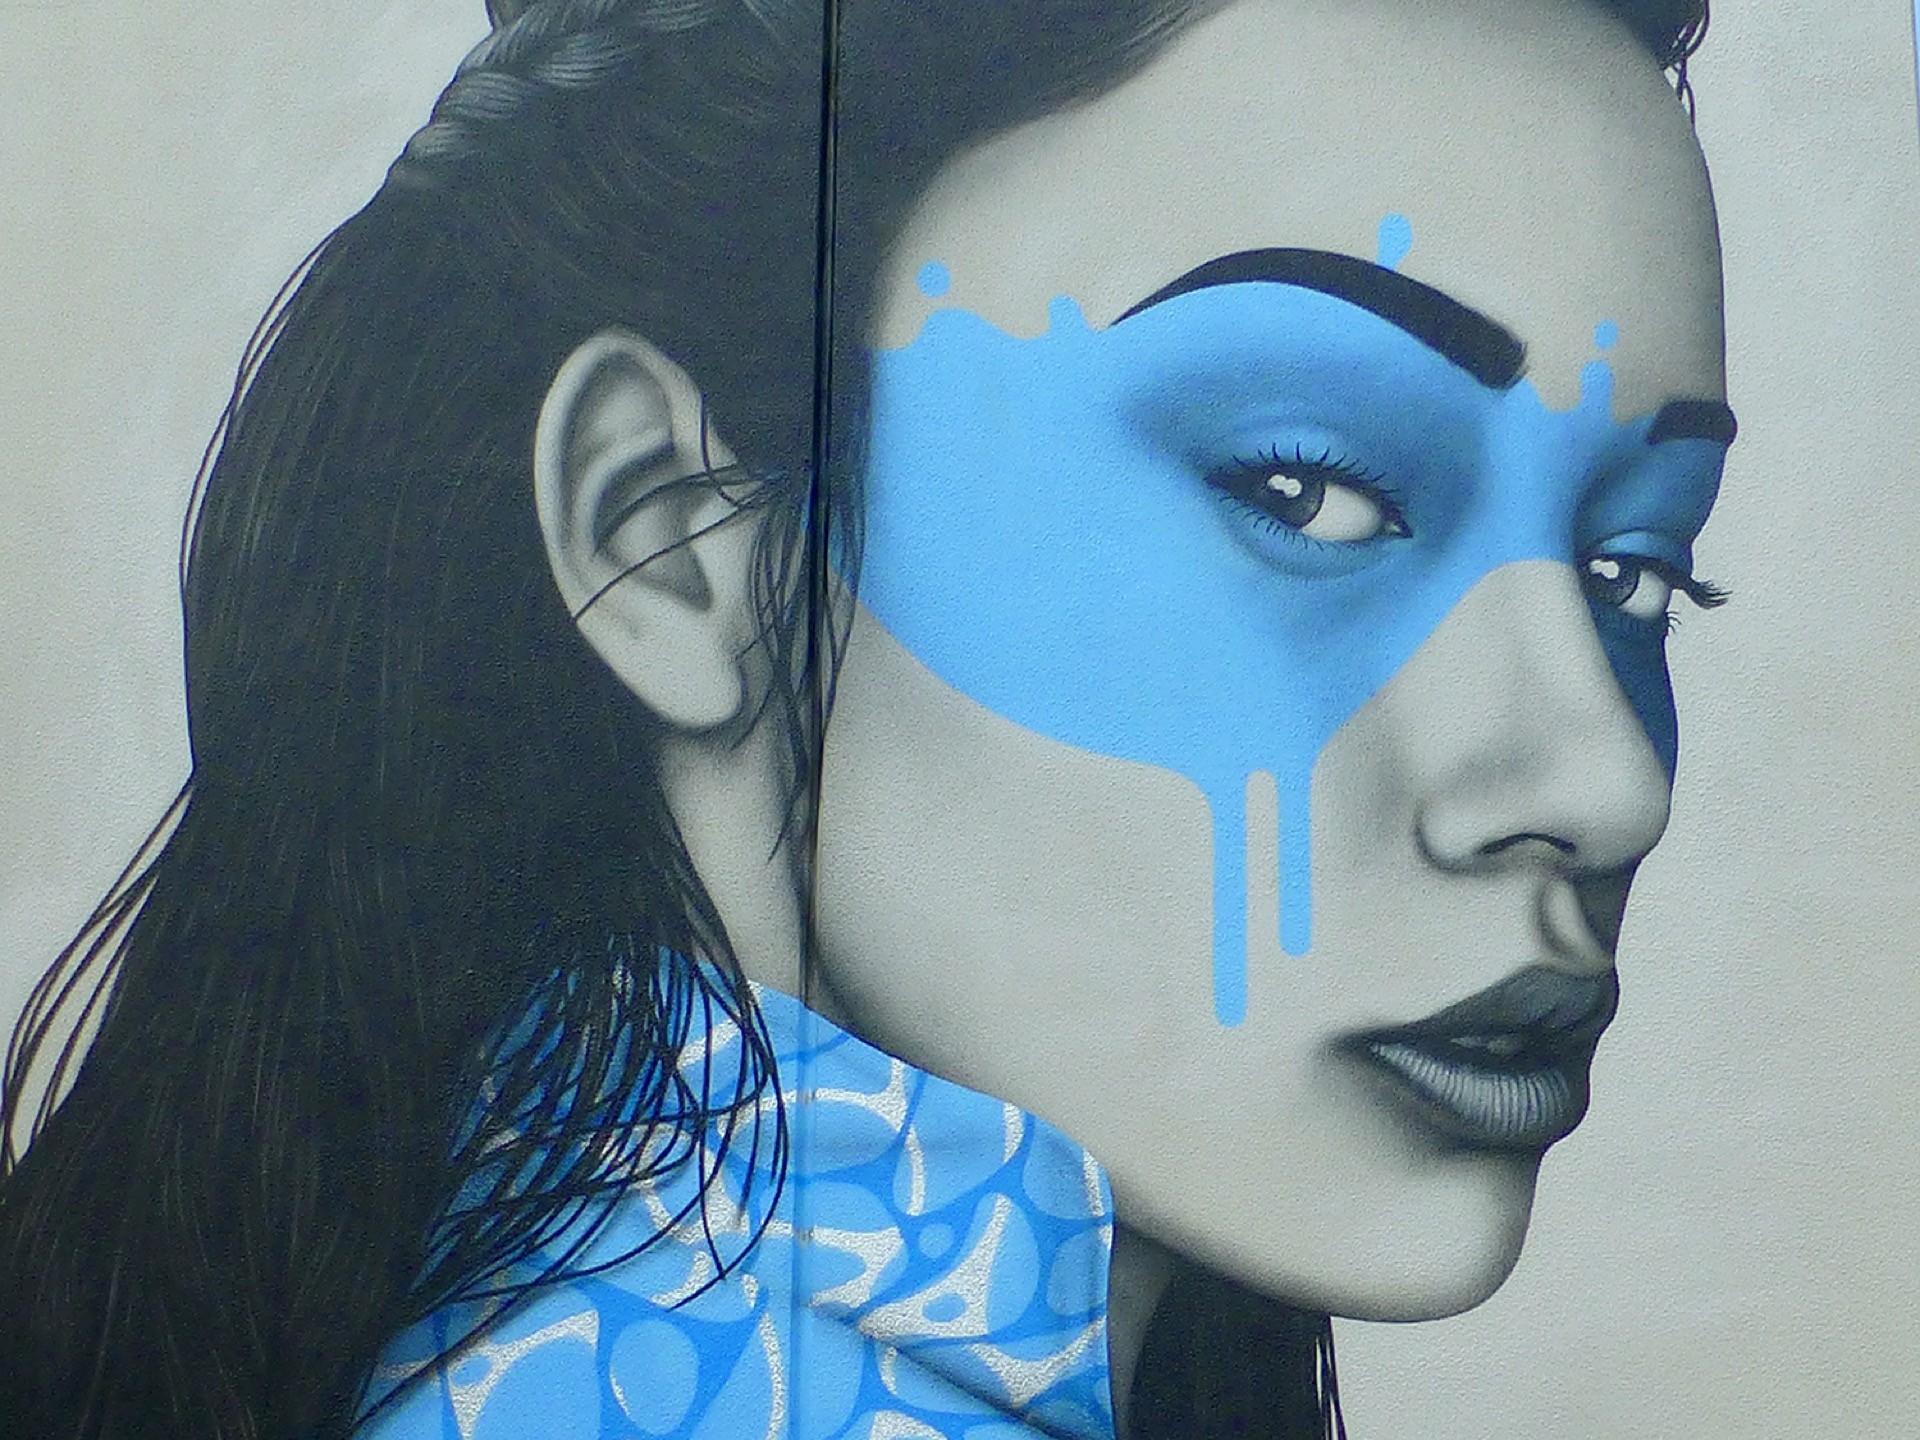 """Shinoya"" by Fin DAC in Melbourne, Australia"